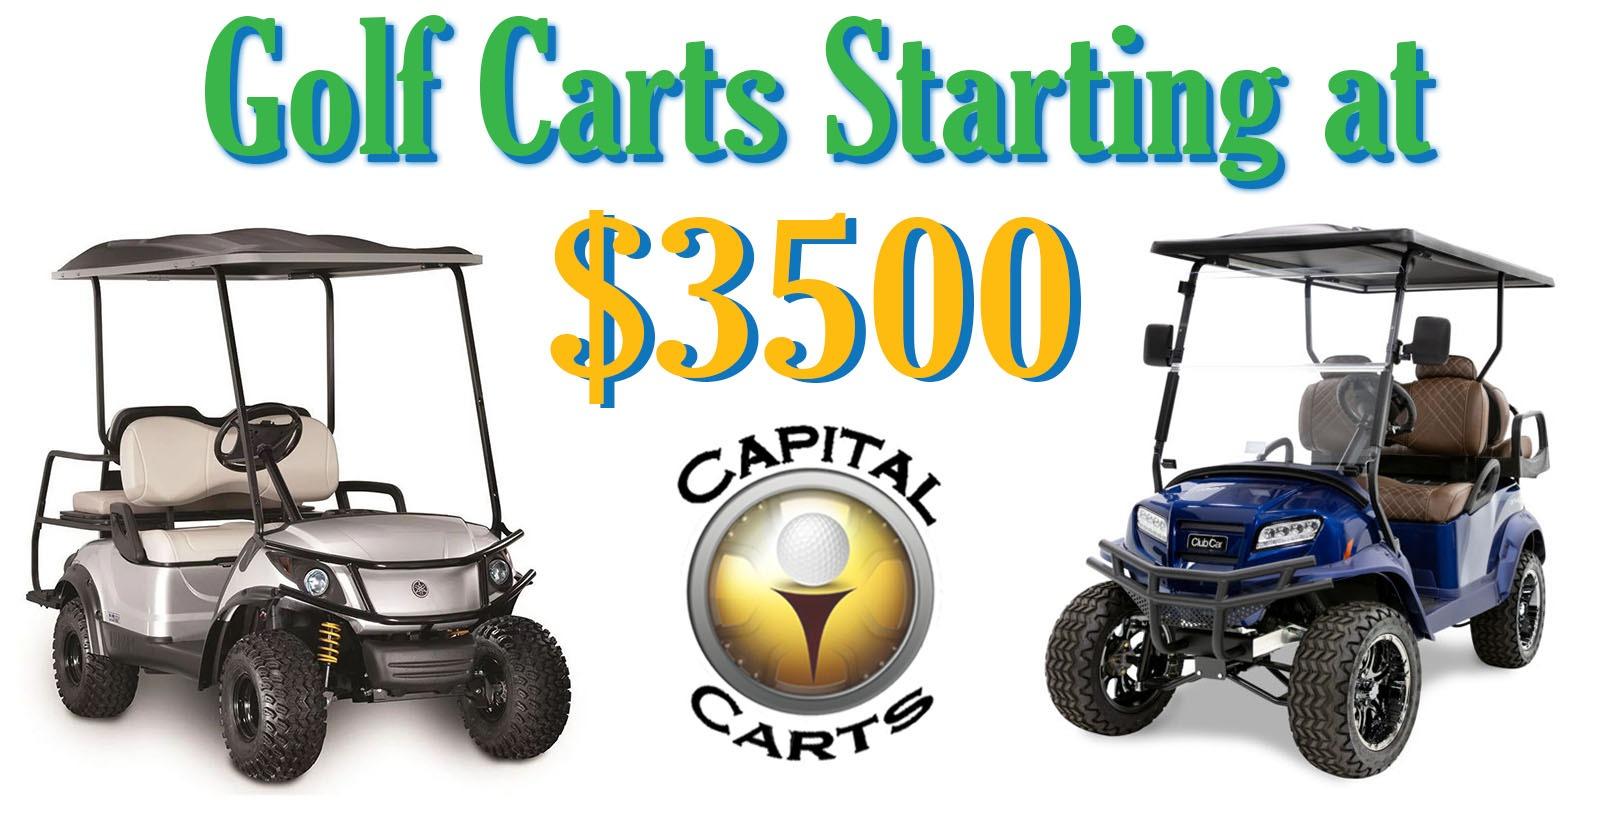 Home Banner - Carts starting at $3500